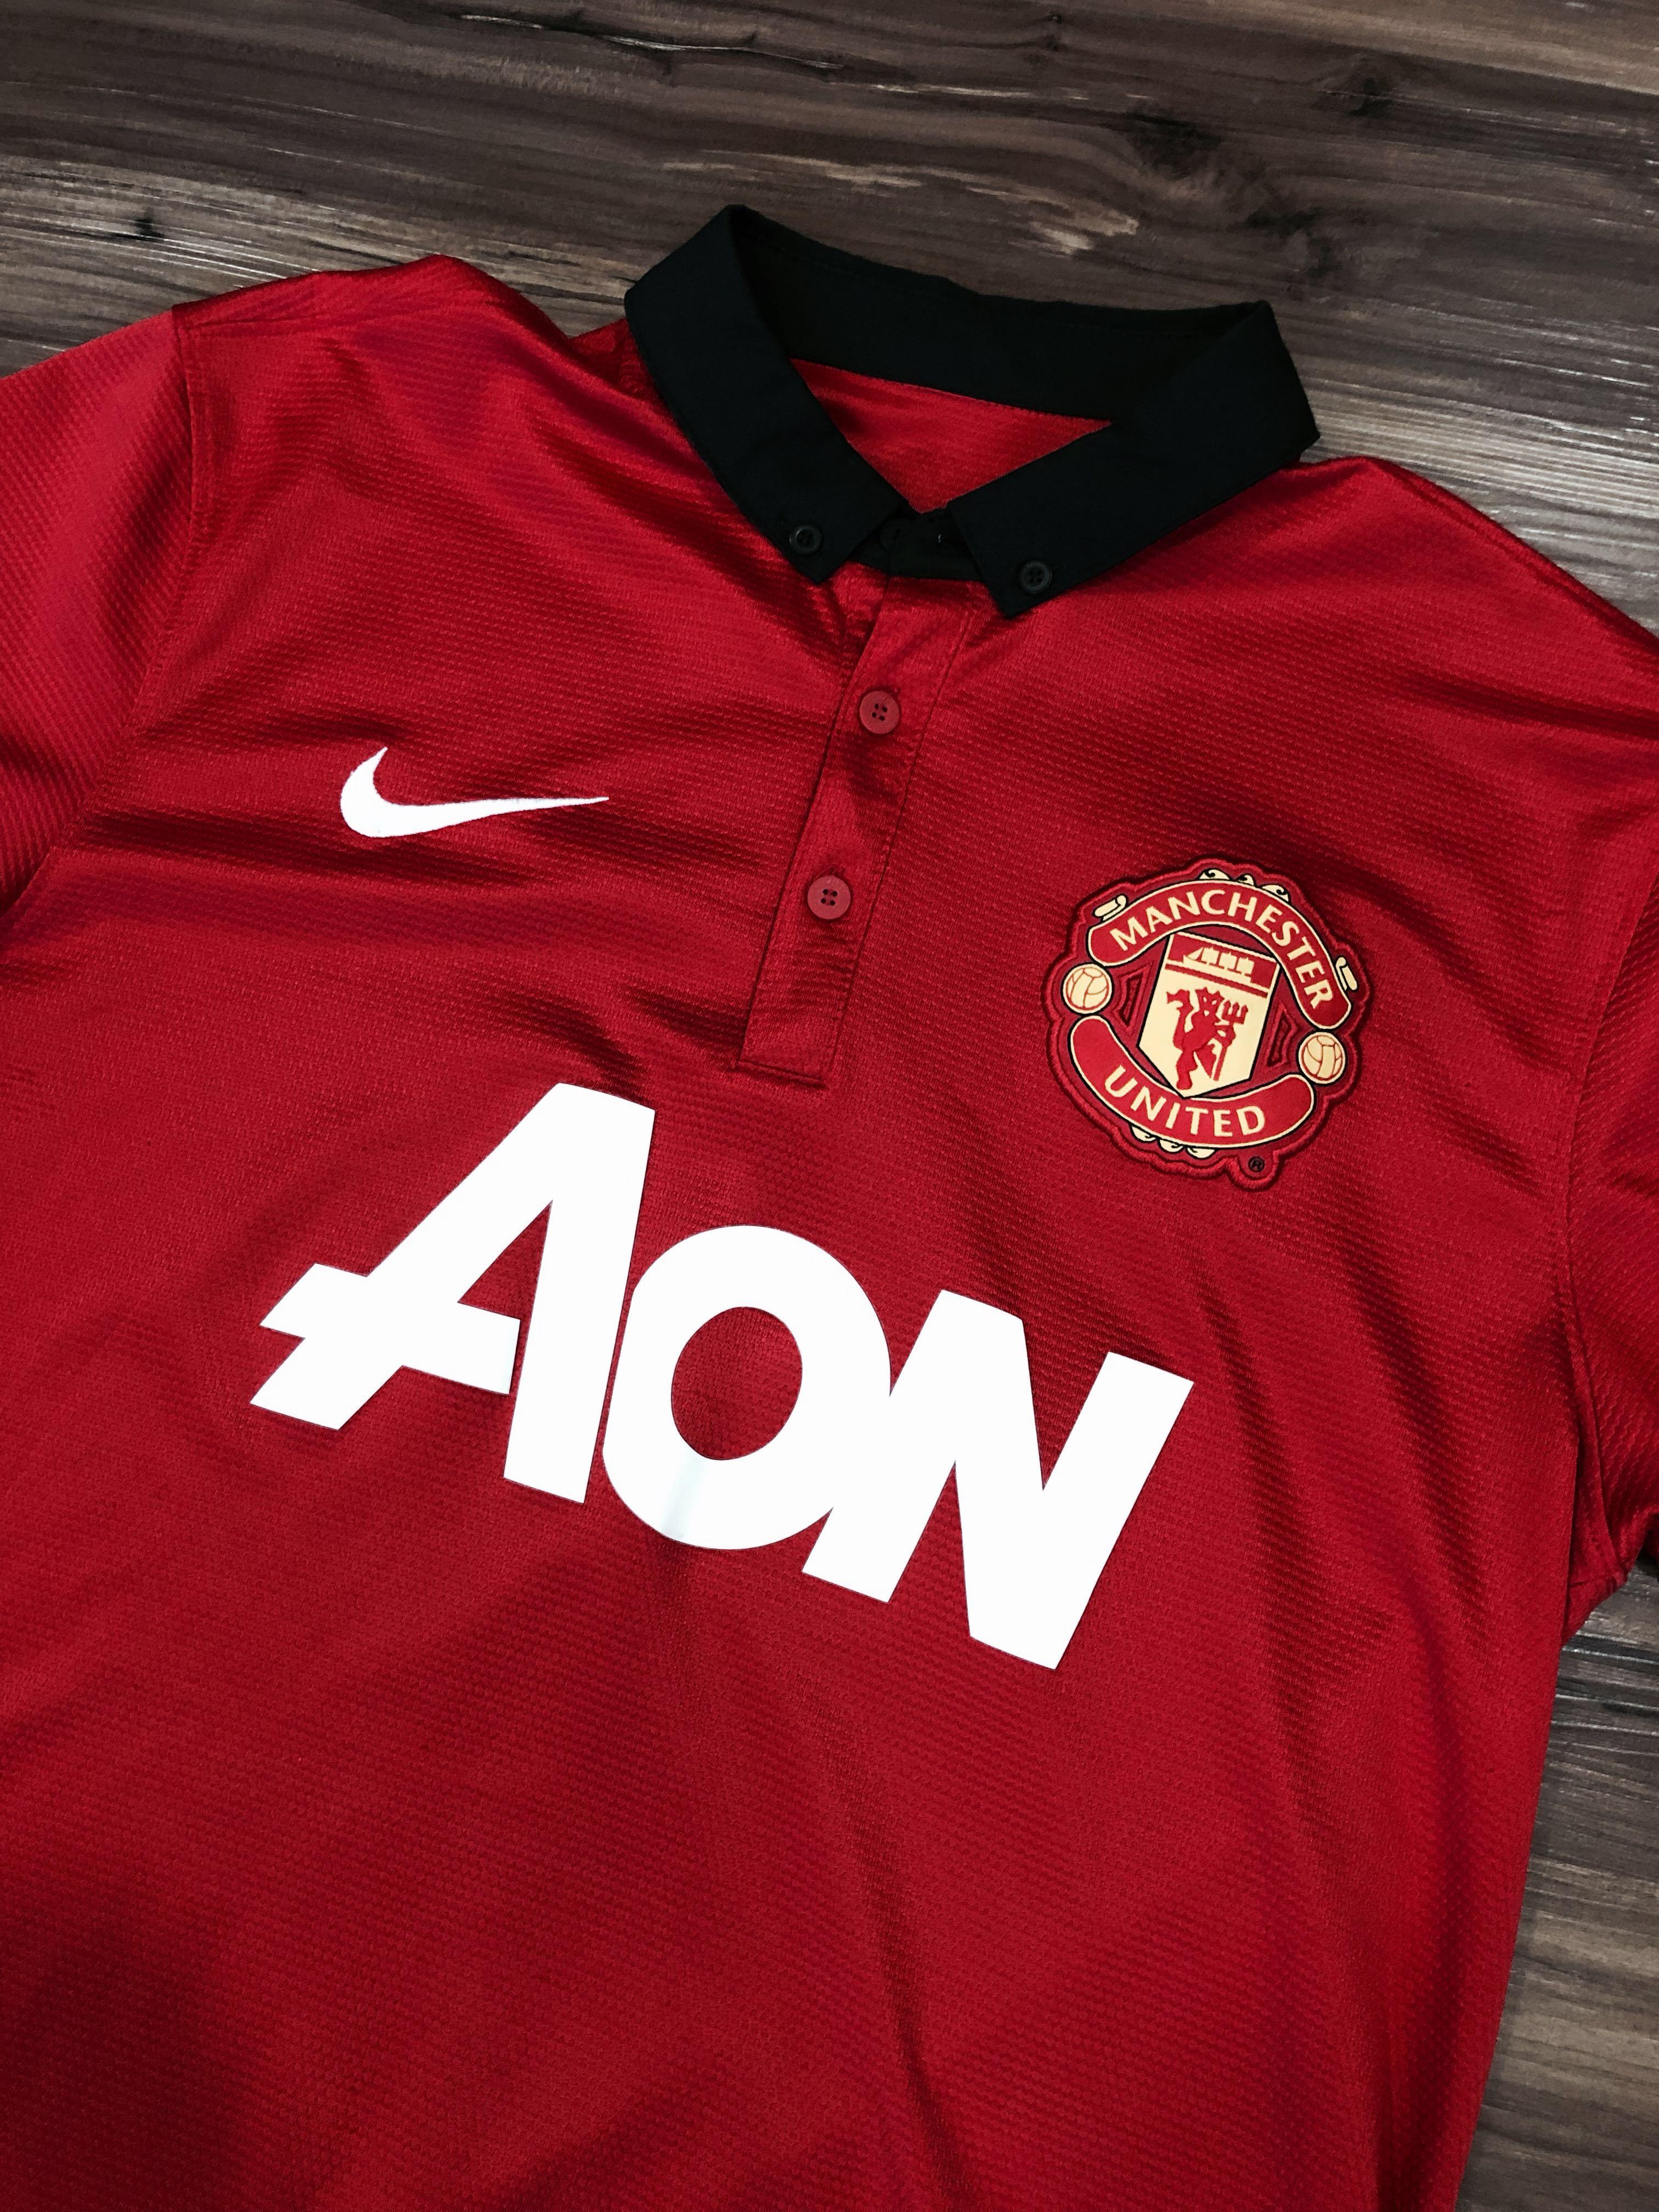 5207147cf6c Man United Shirt 2013 14 | Top Mode Depot